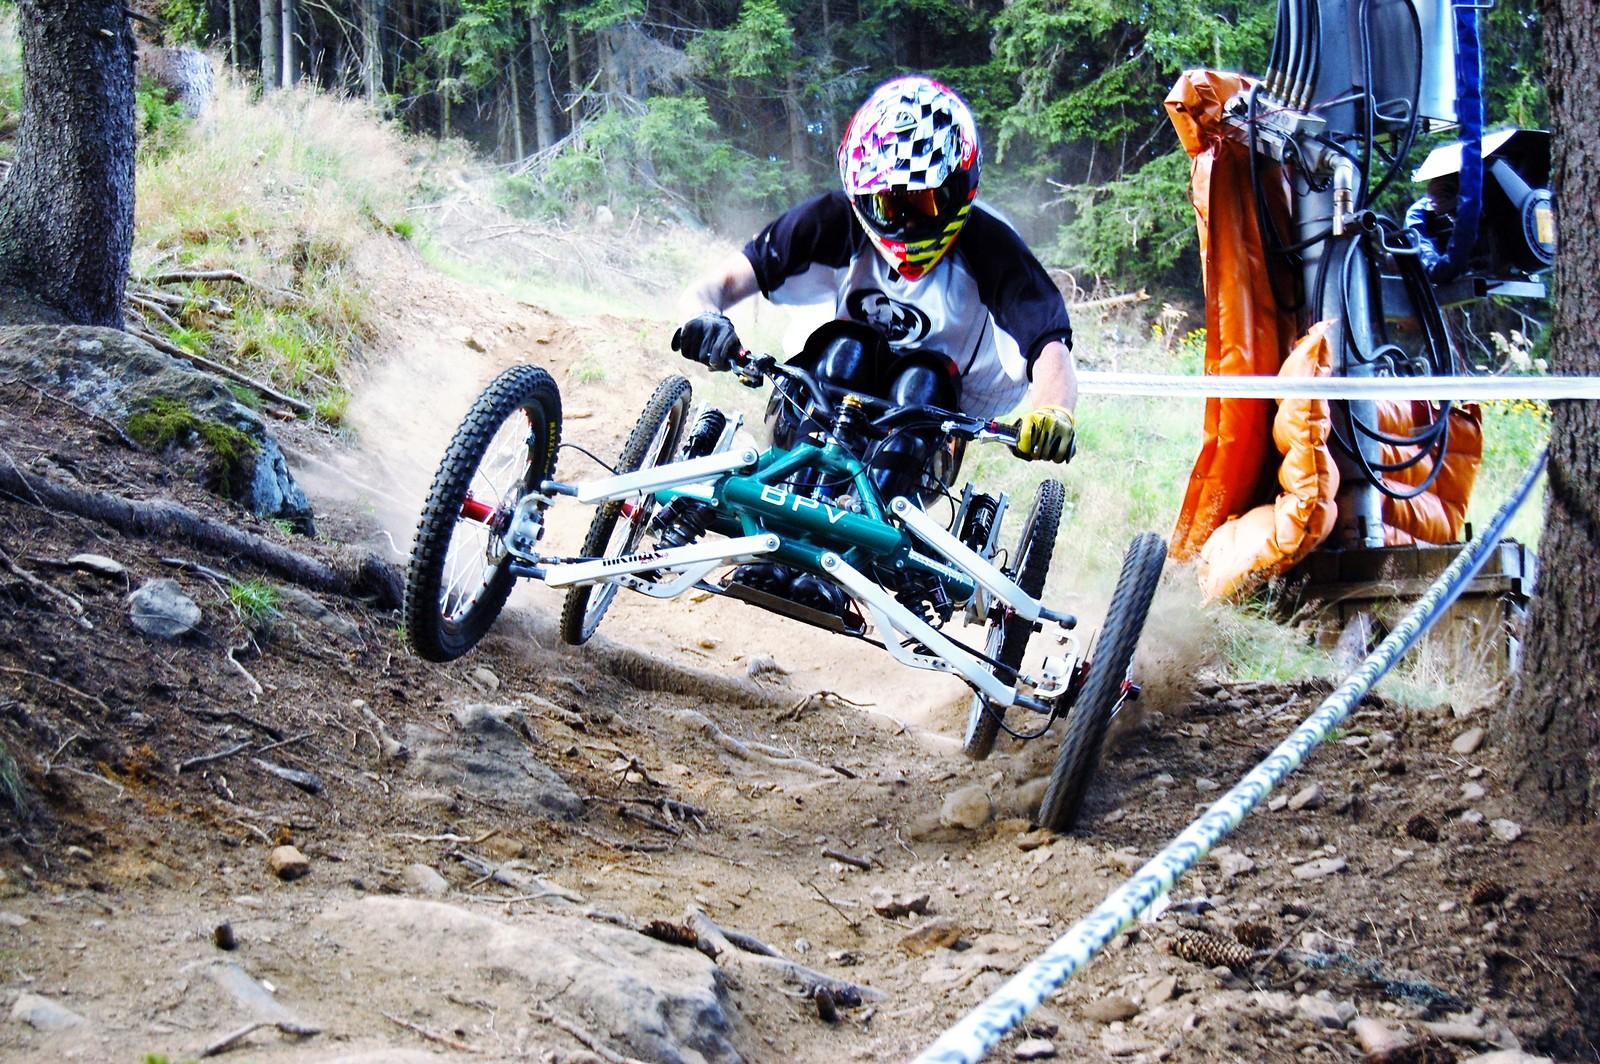 DSC 0042u - wozikmajkl83 - Mountain Biking Pictures - Vital MTB